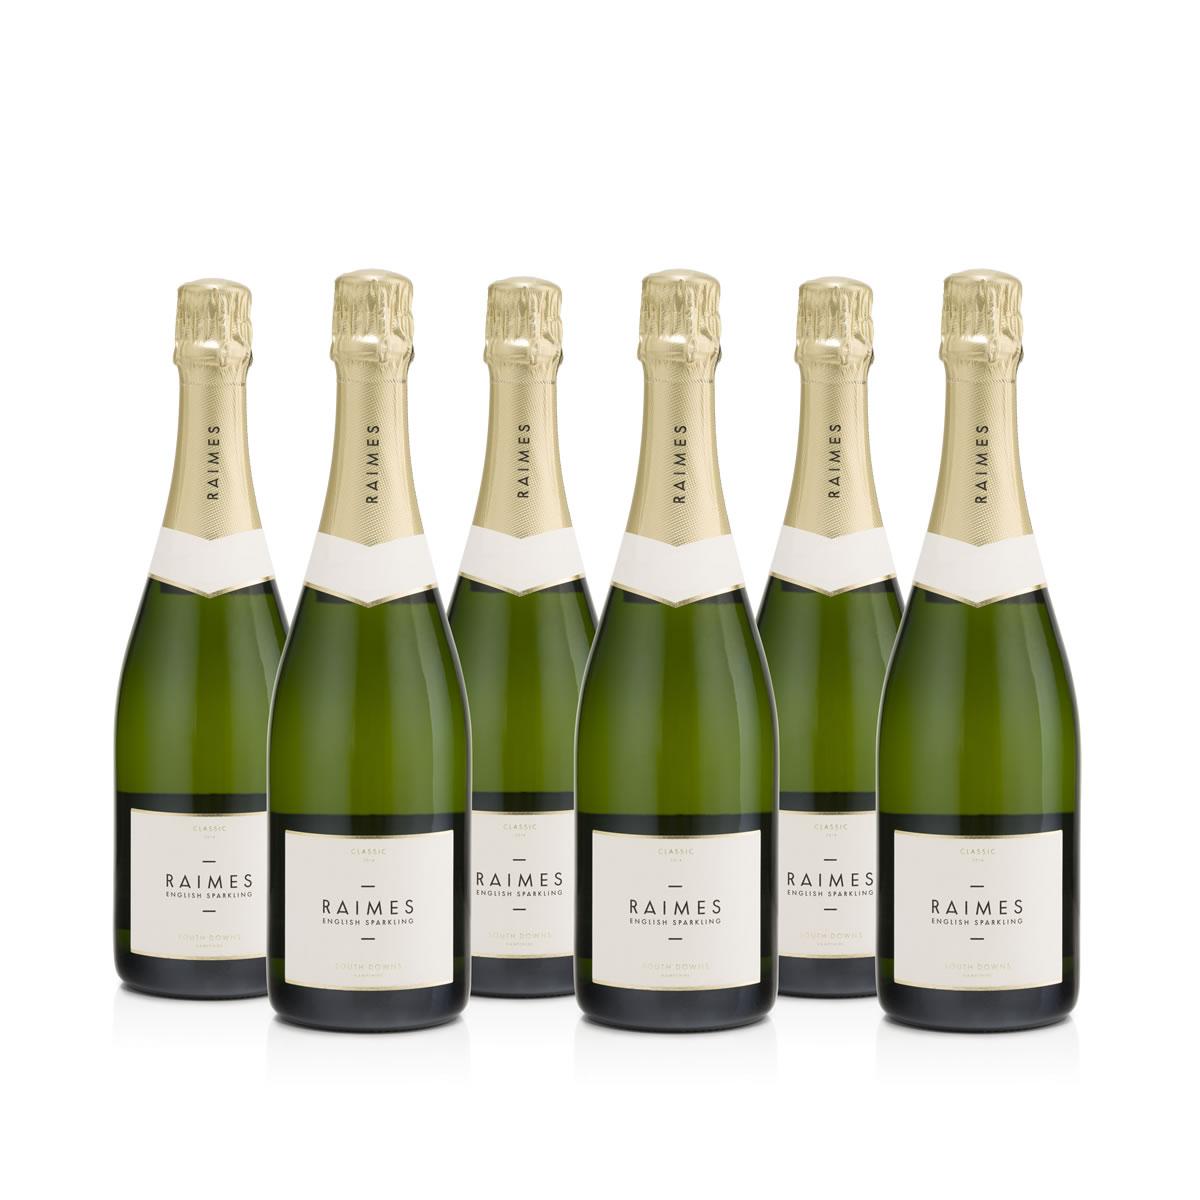 Case of 6 - 2015 Classic - Raimes English Sparkling Wine